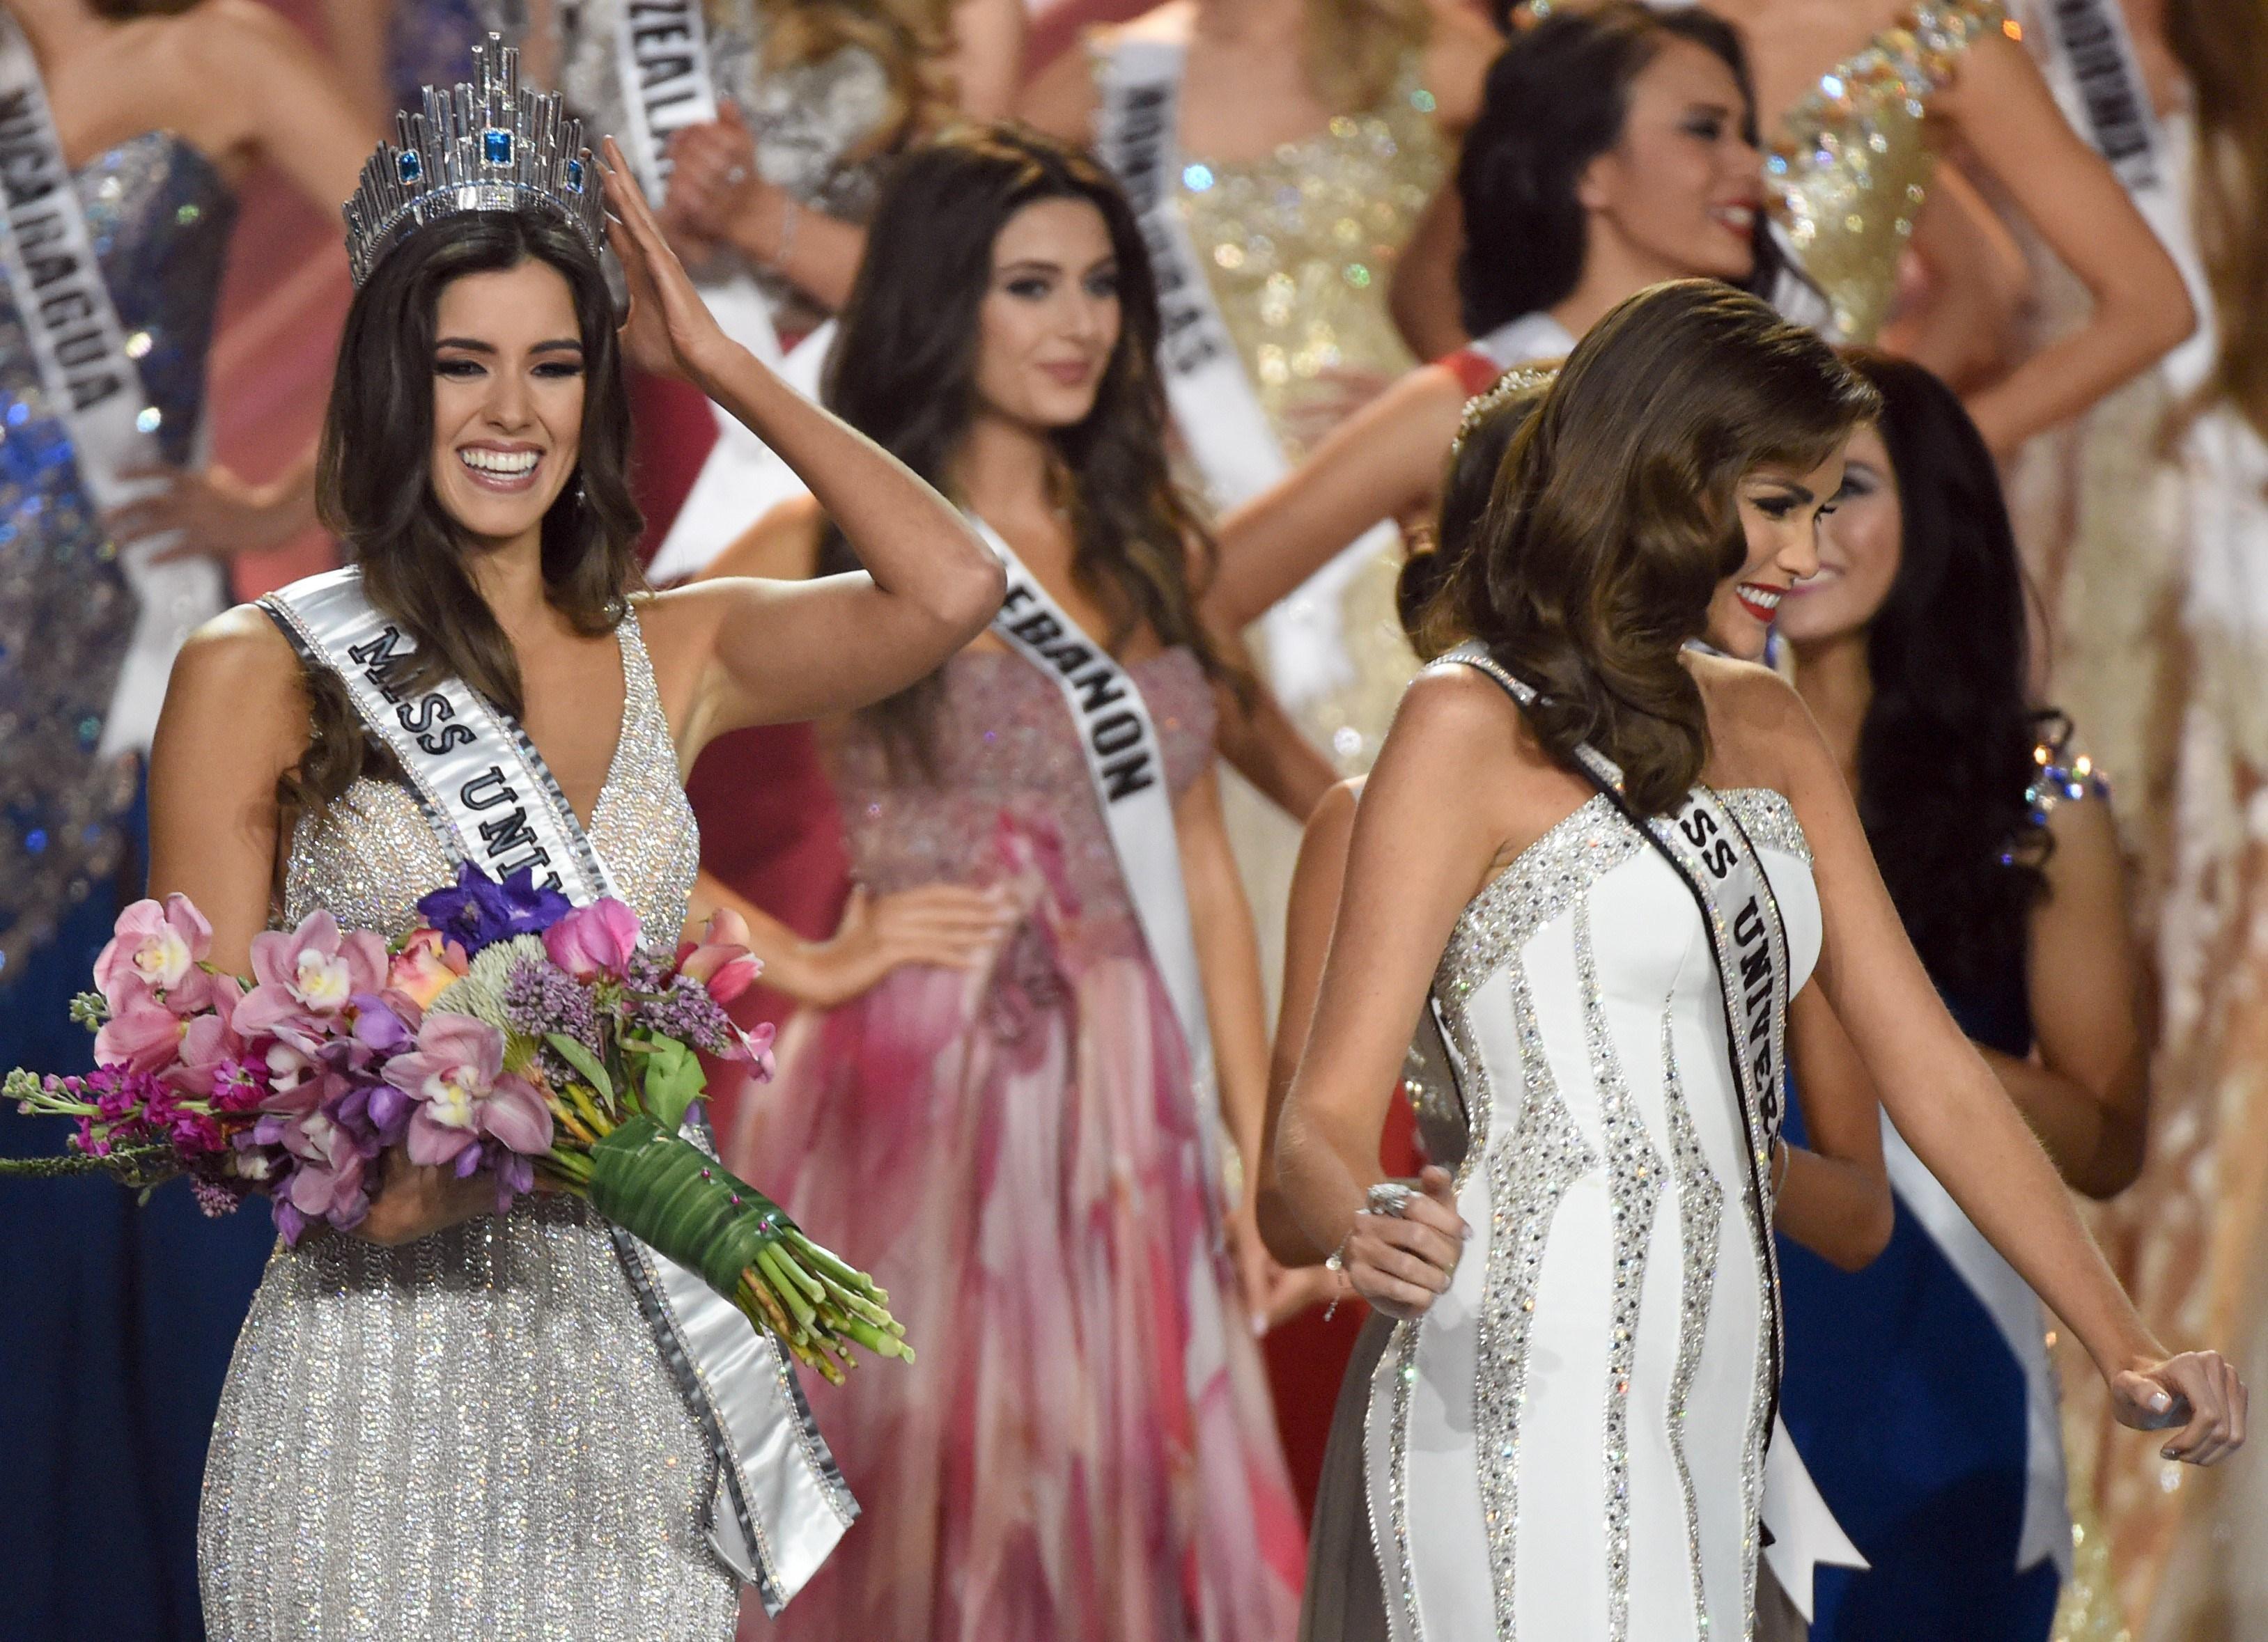 Lesbian beauty pageants, mature men nakedtumblr